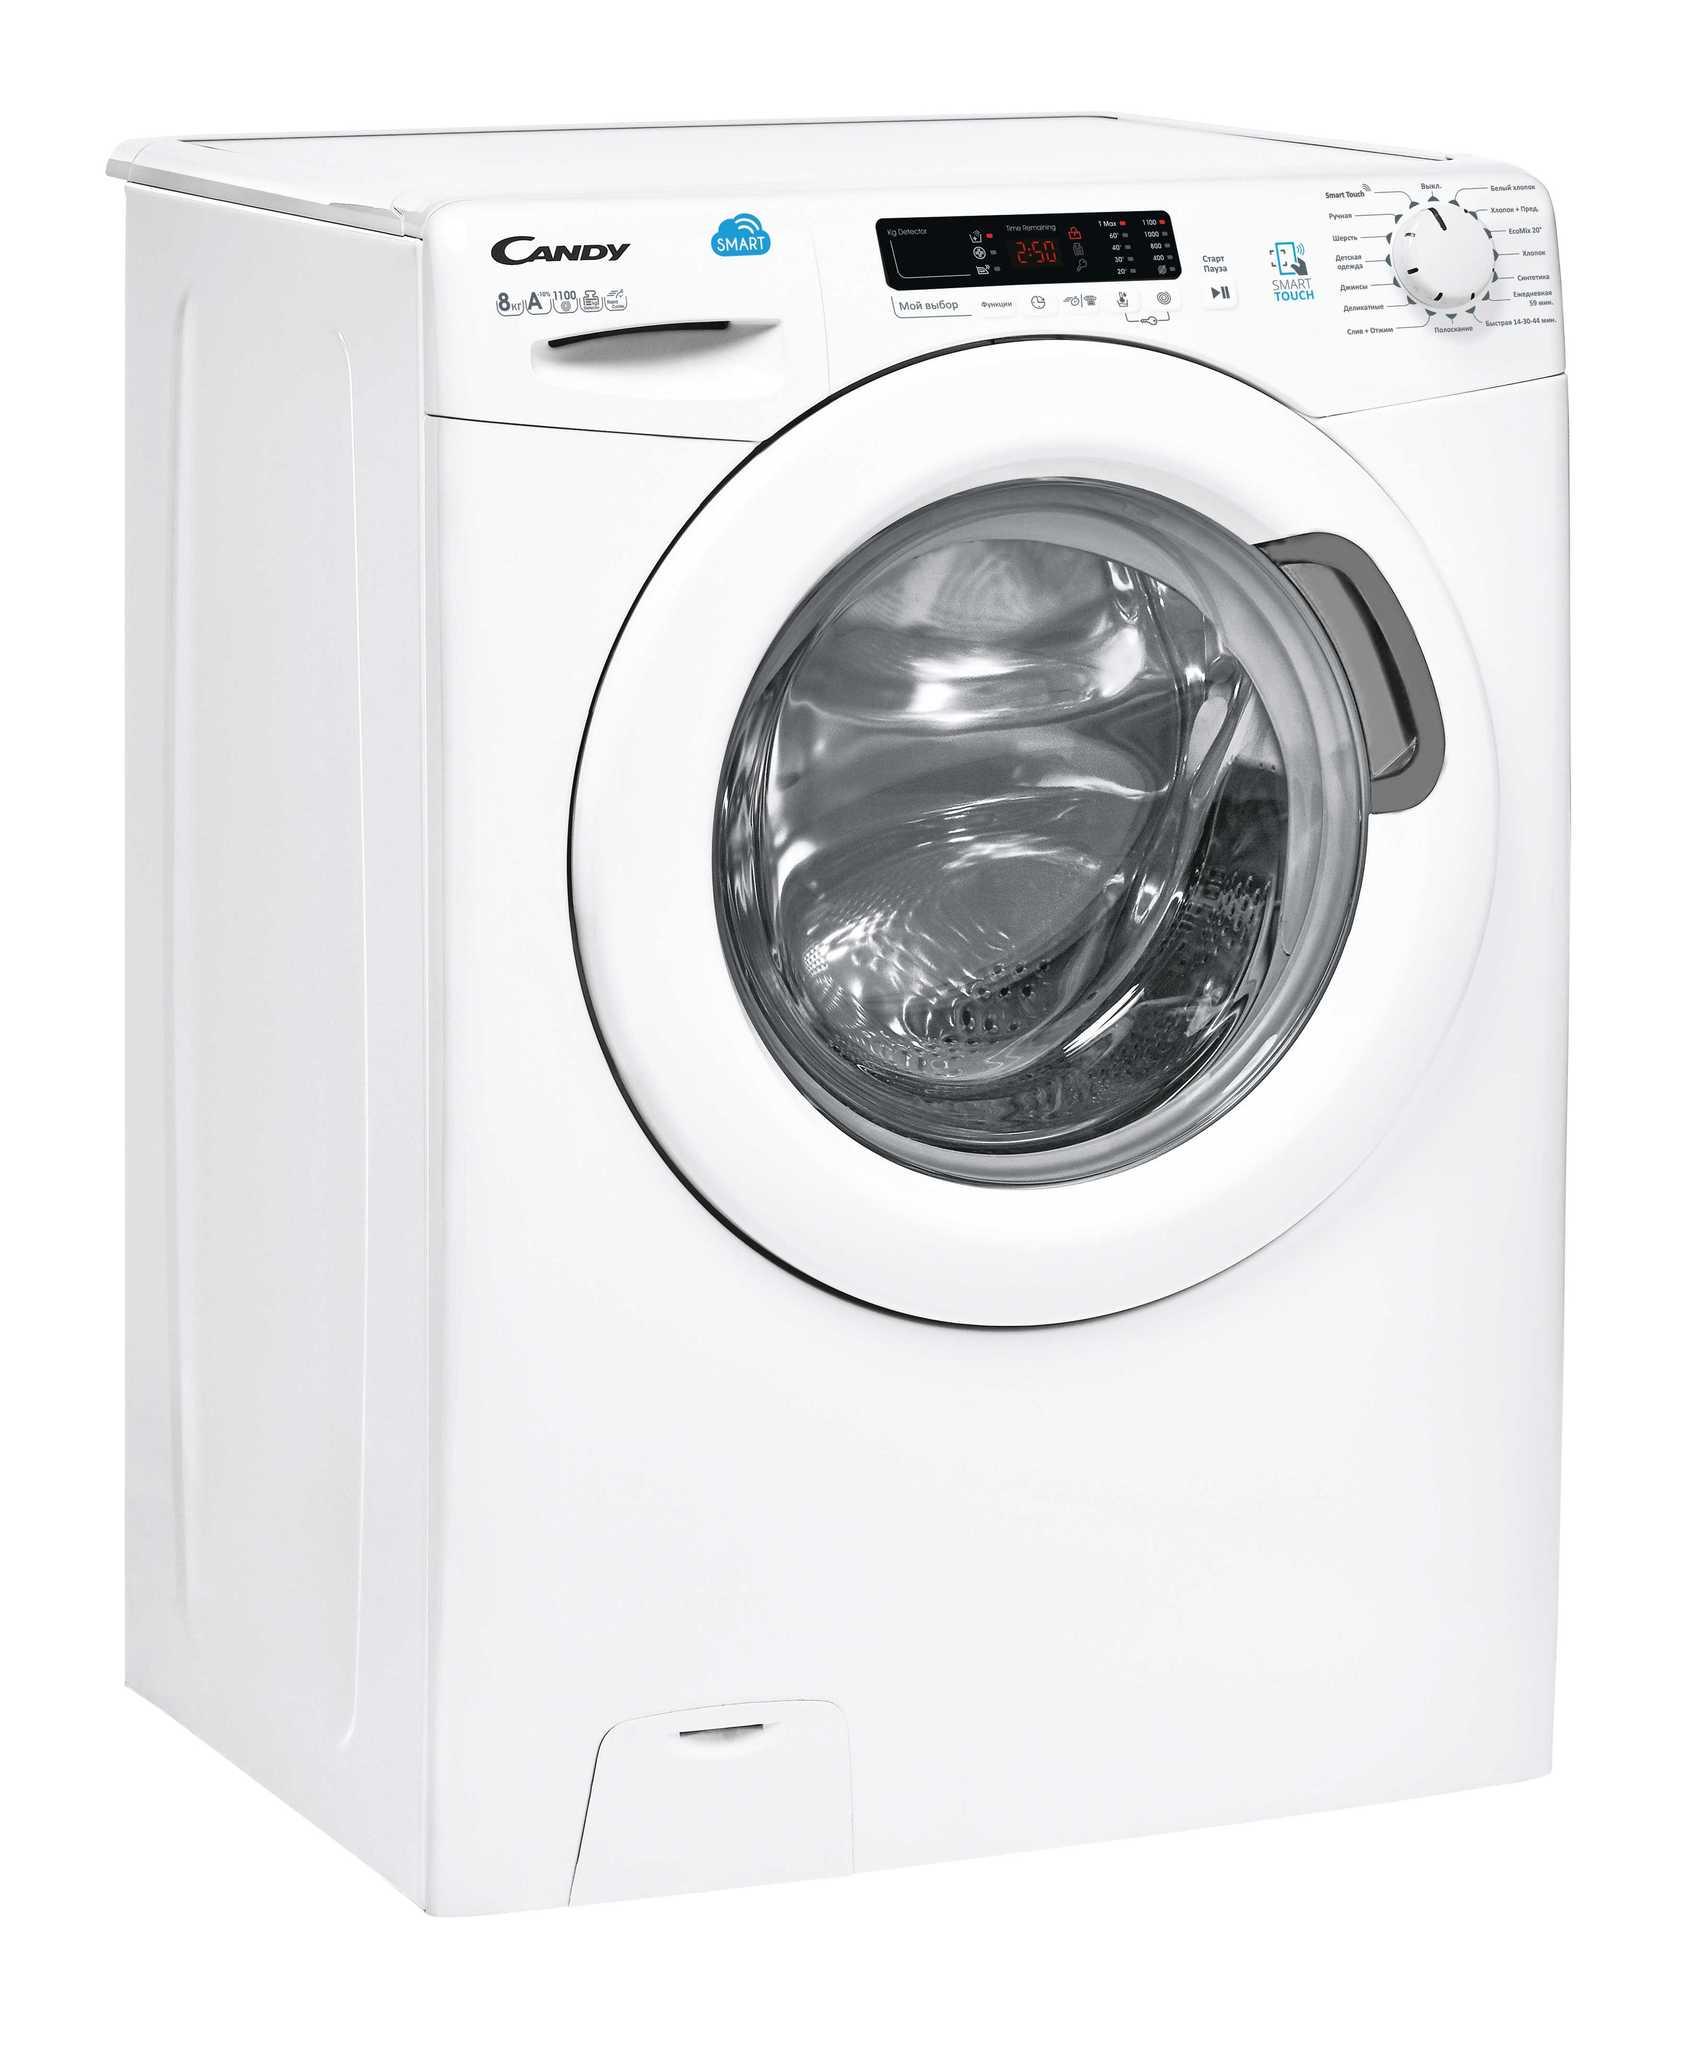 Узкая стиральная машина Candy ACS441182D1/2-07 фото